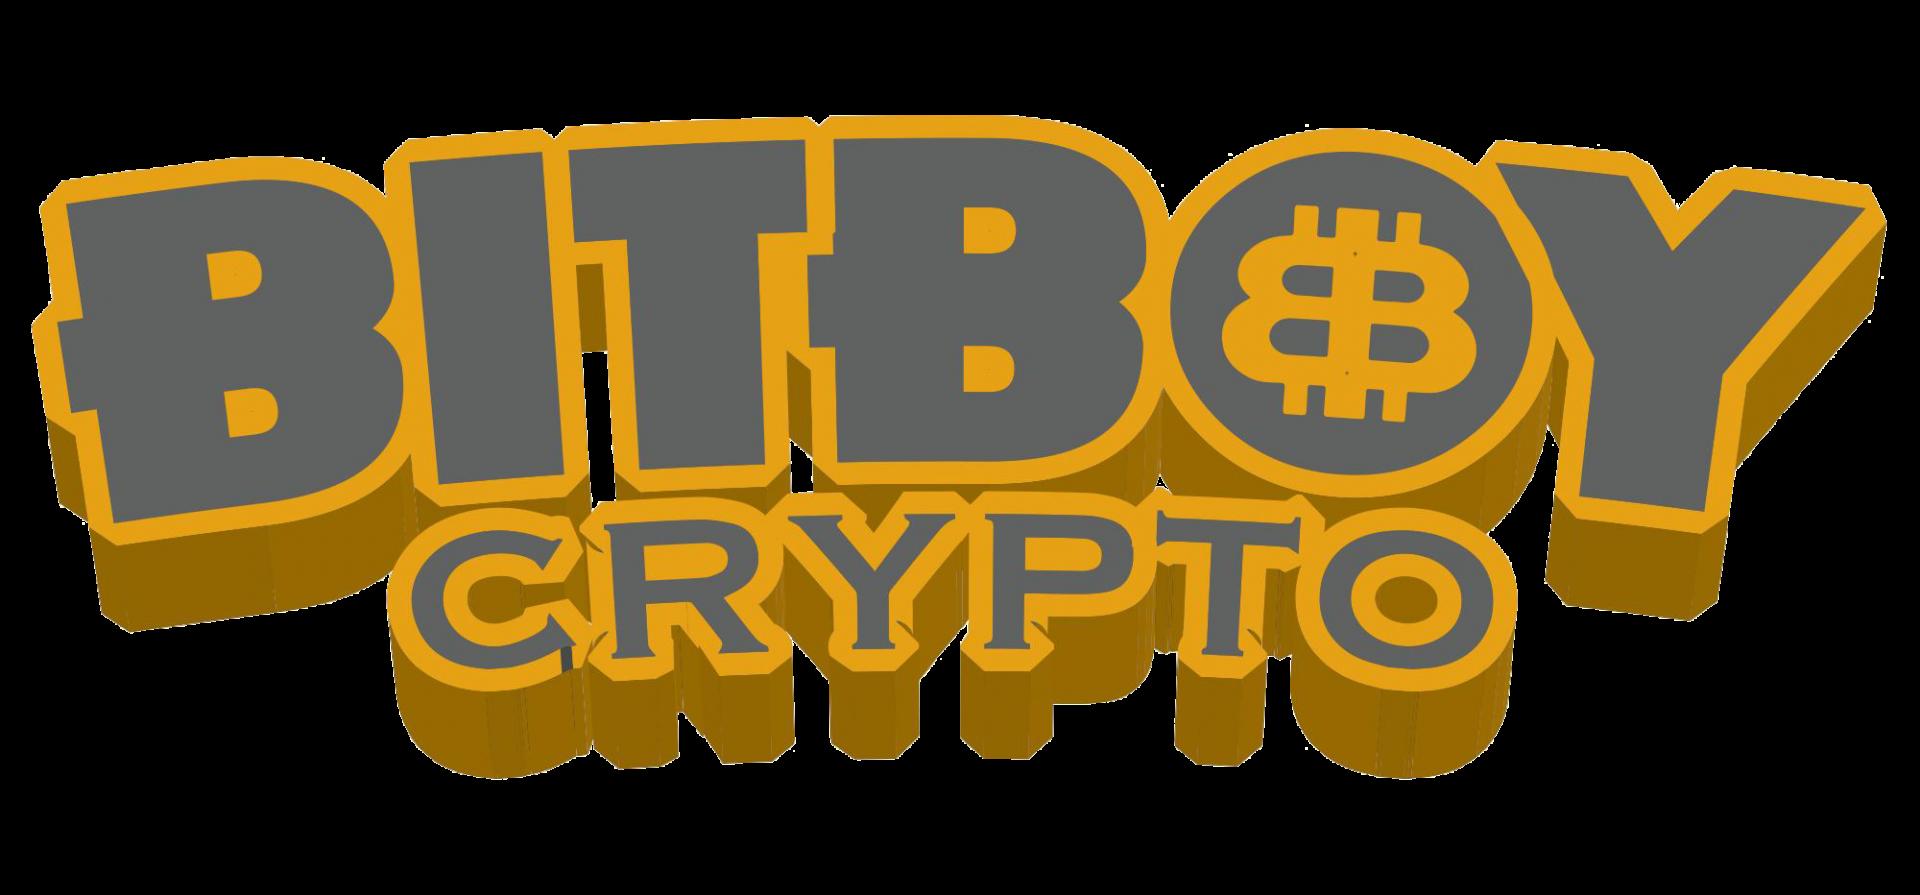 bitboycrypto 2